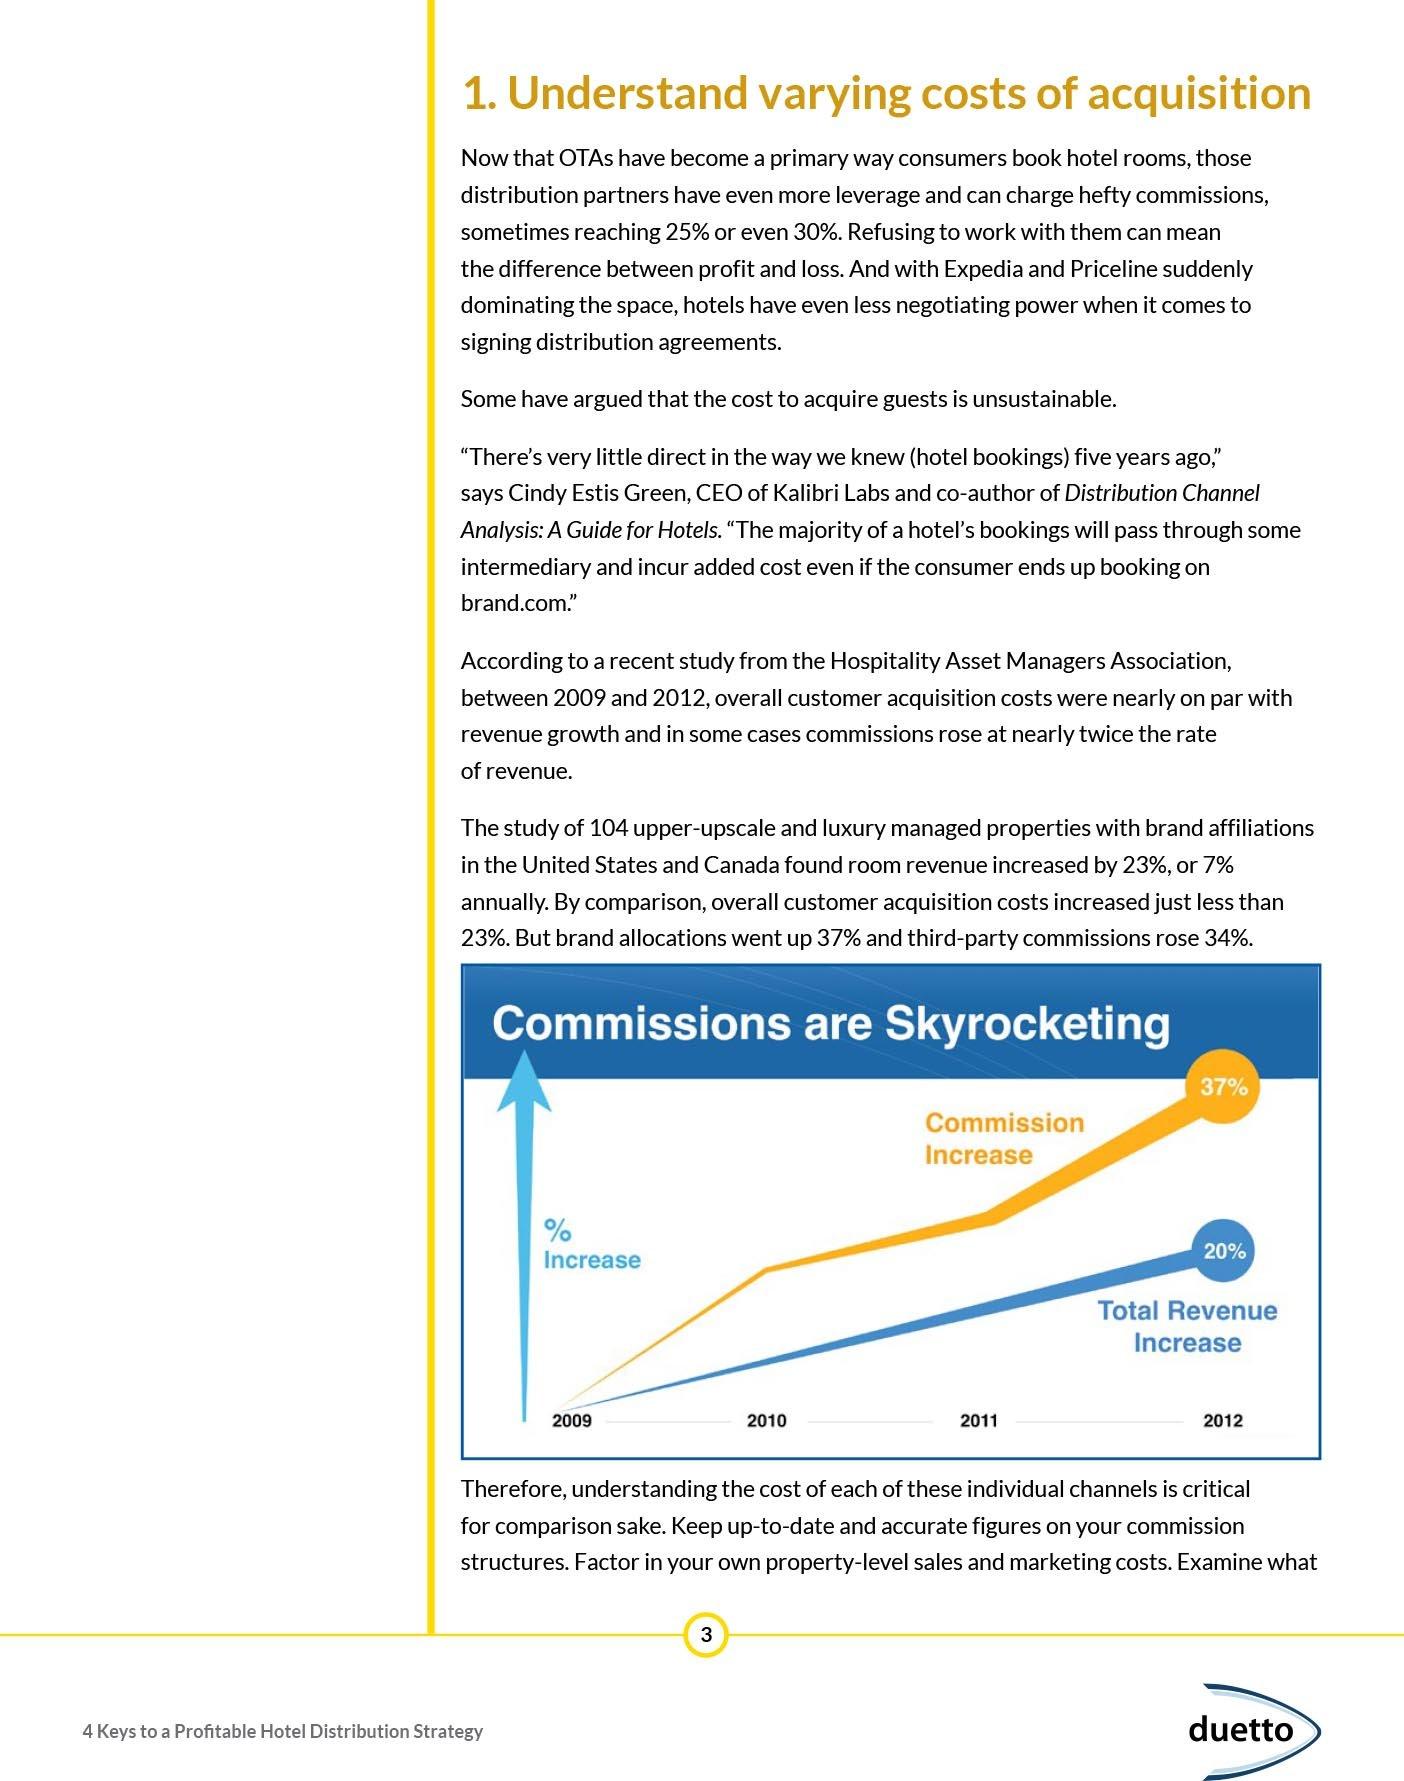 3 4-keys-to-a-profitable-hotel-distribution-strategy-3.jpg